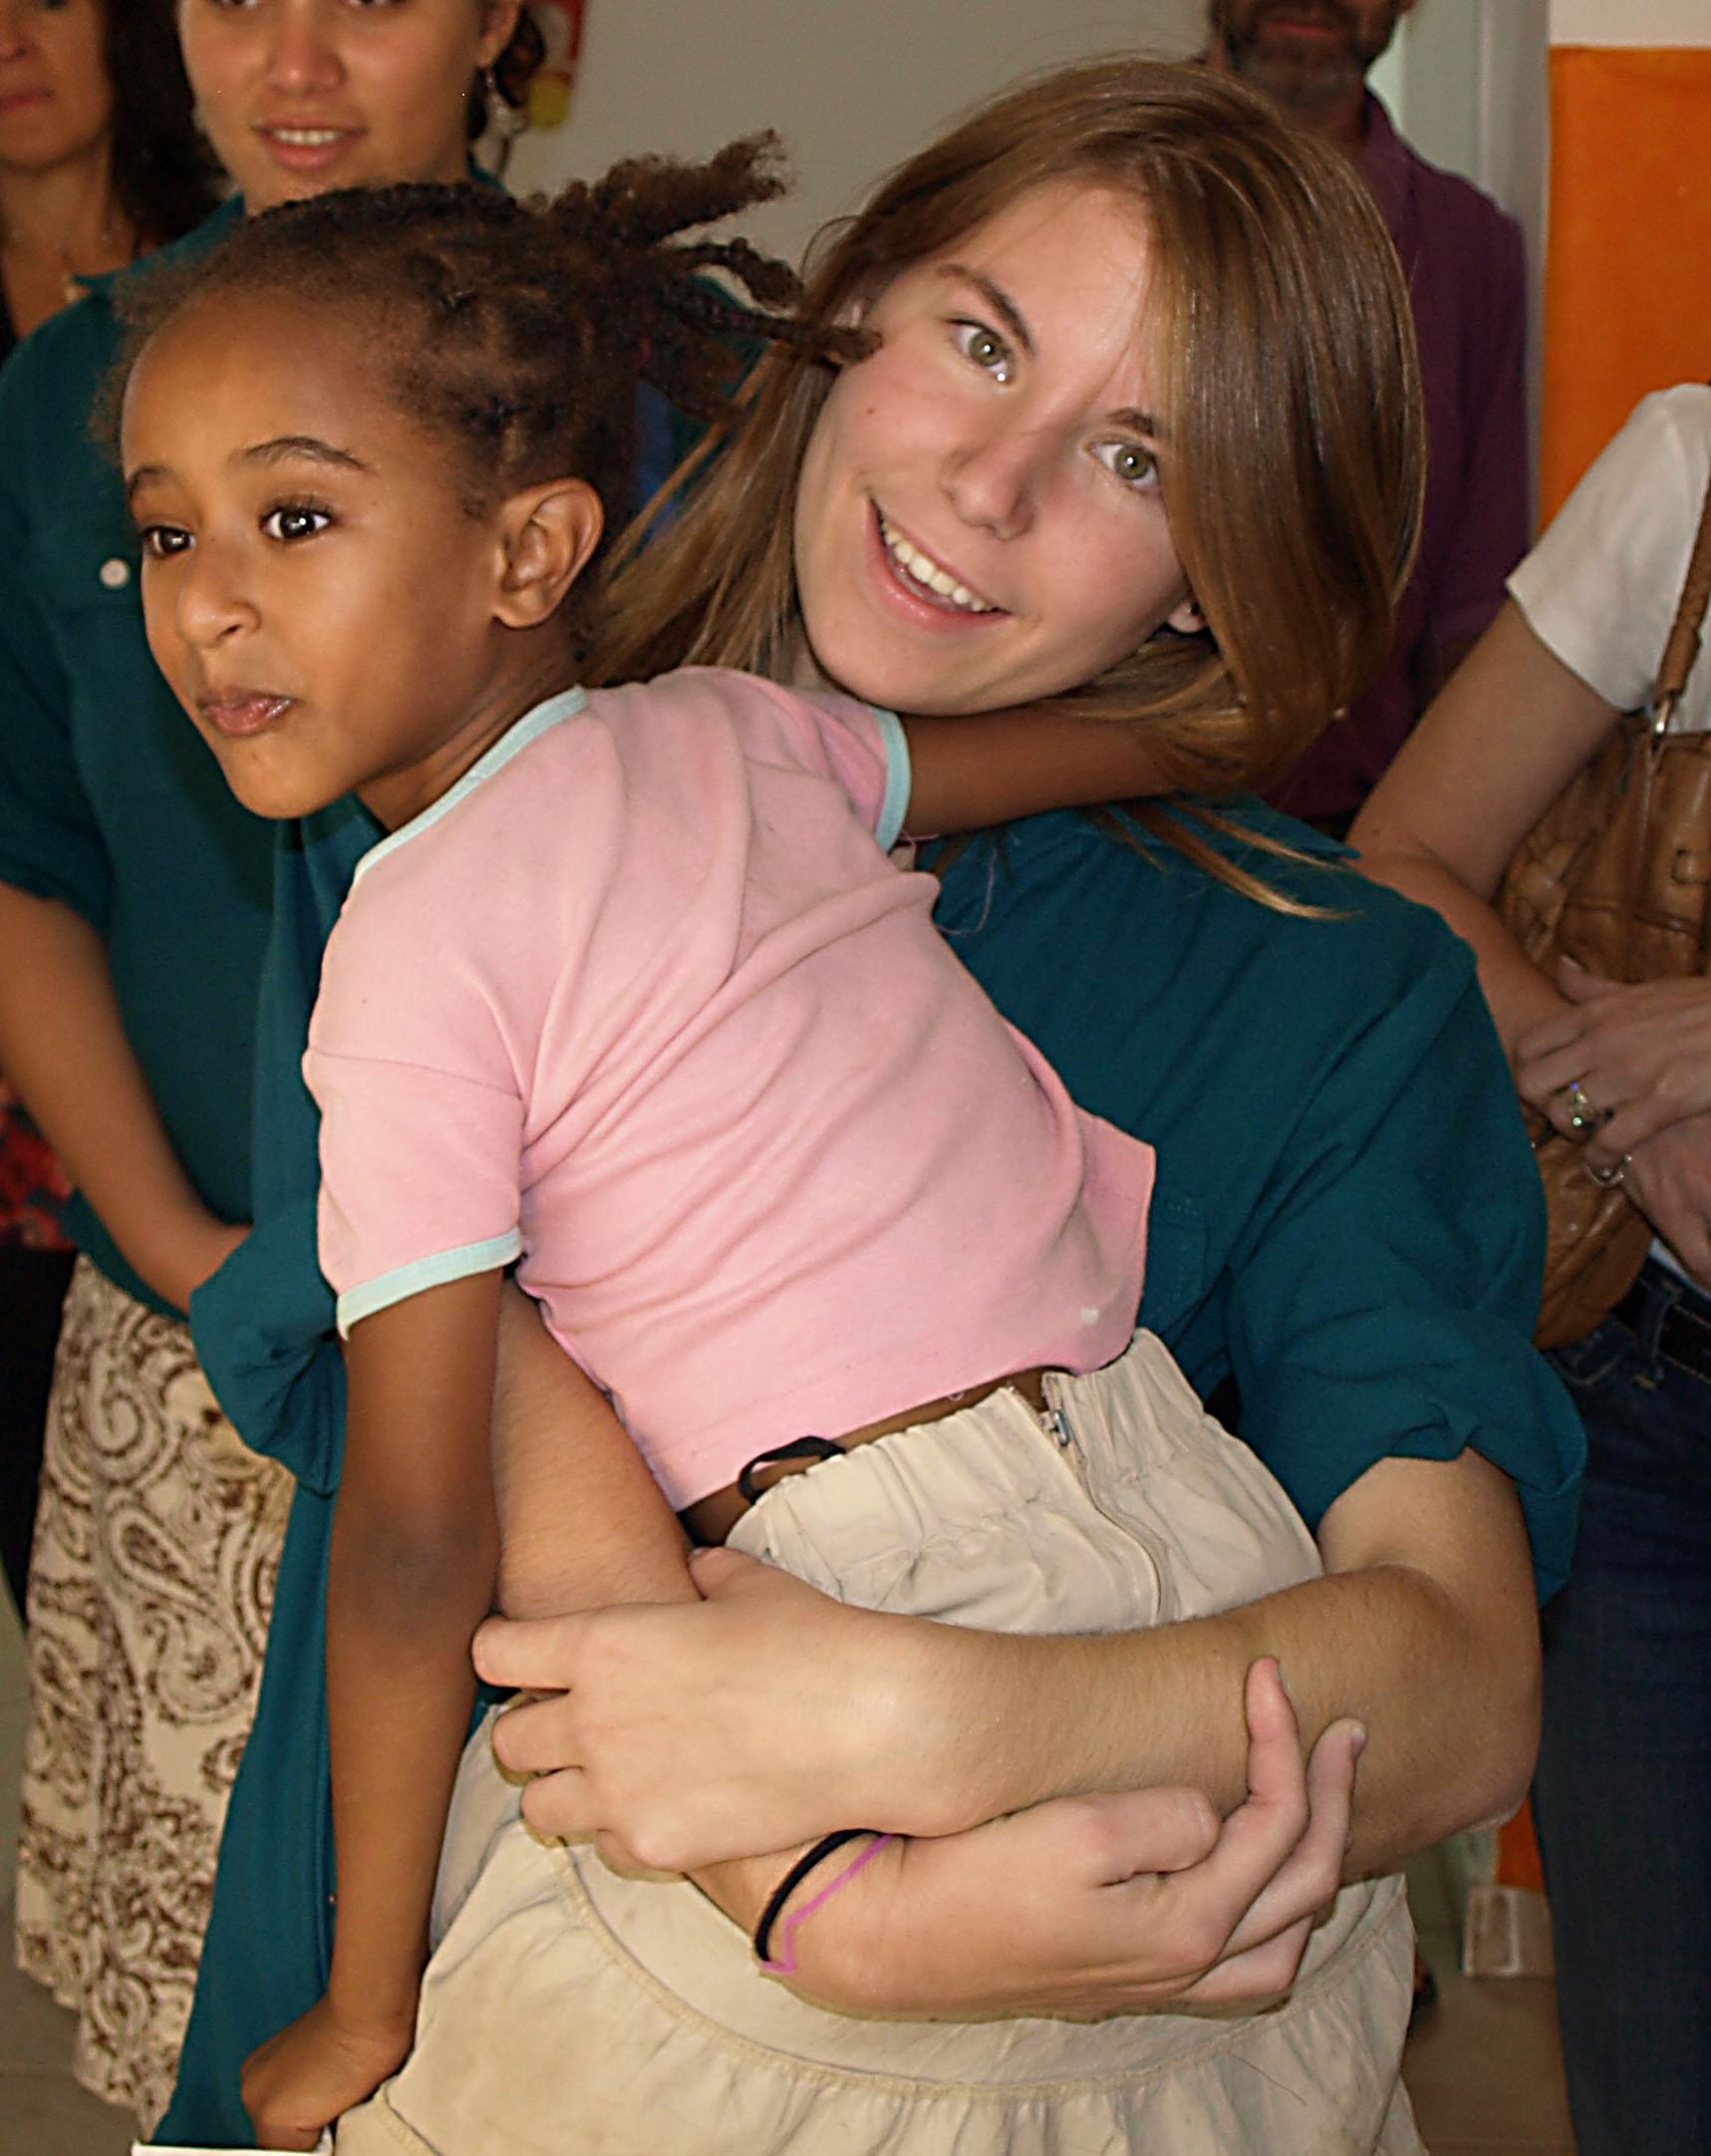 NOAM member with Ethiopian Jewish Child Illustrating Masorti Sermons